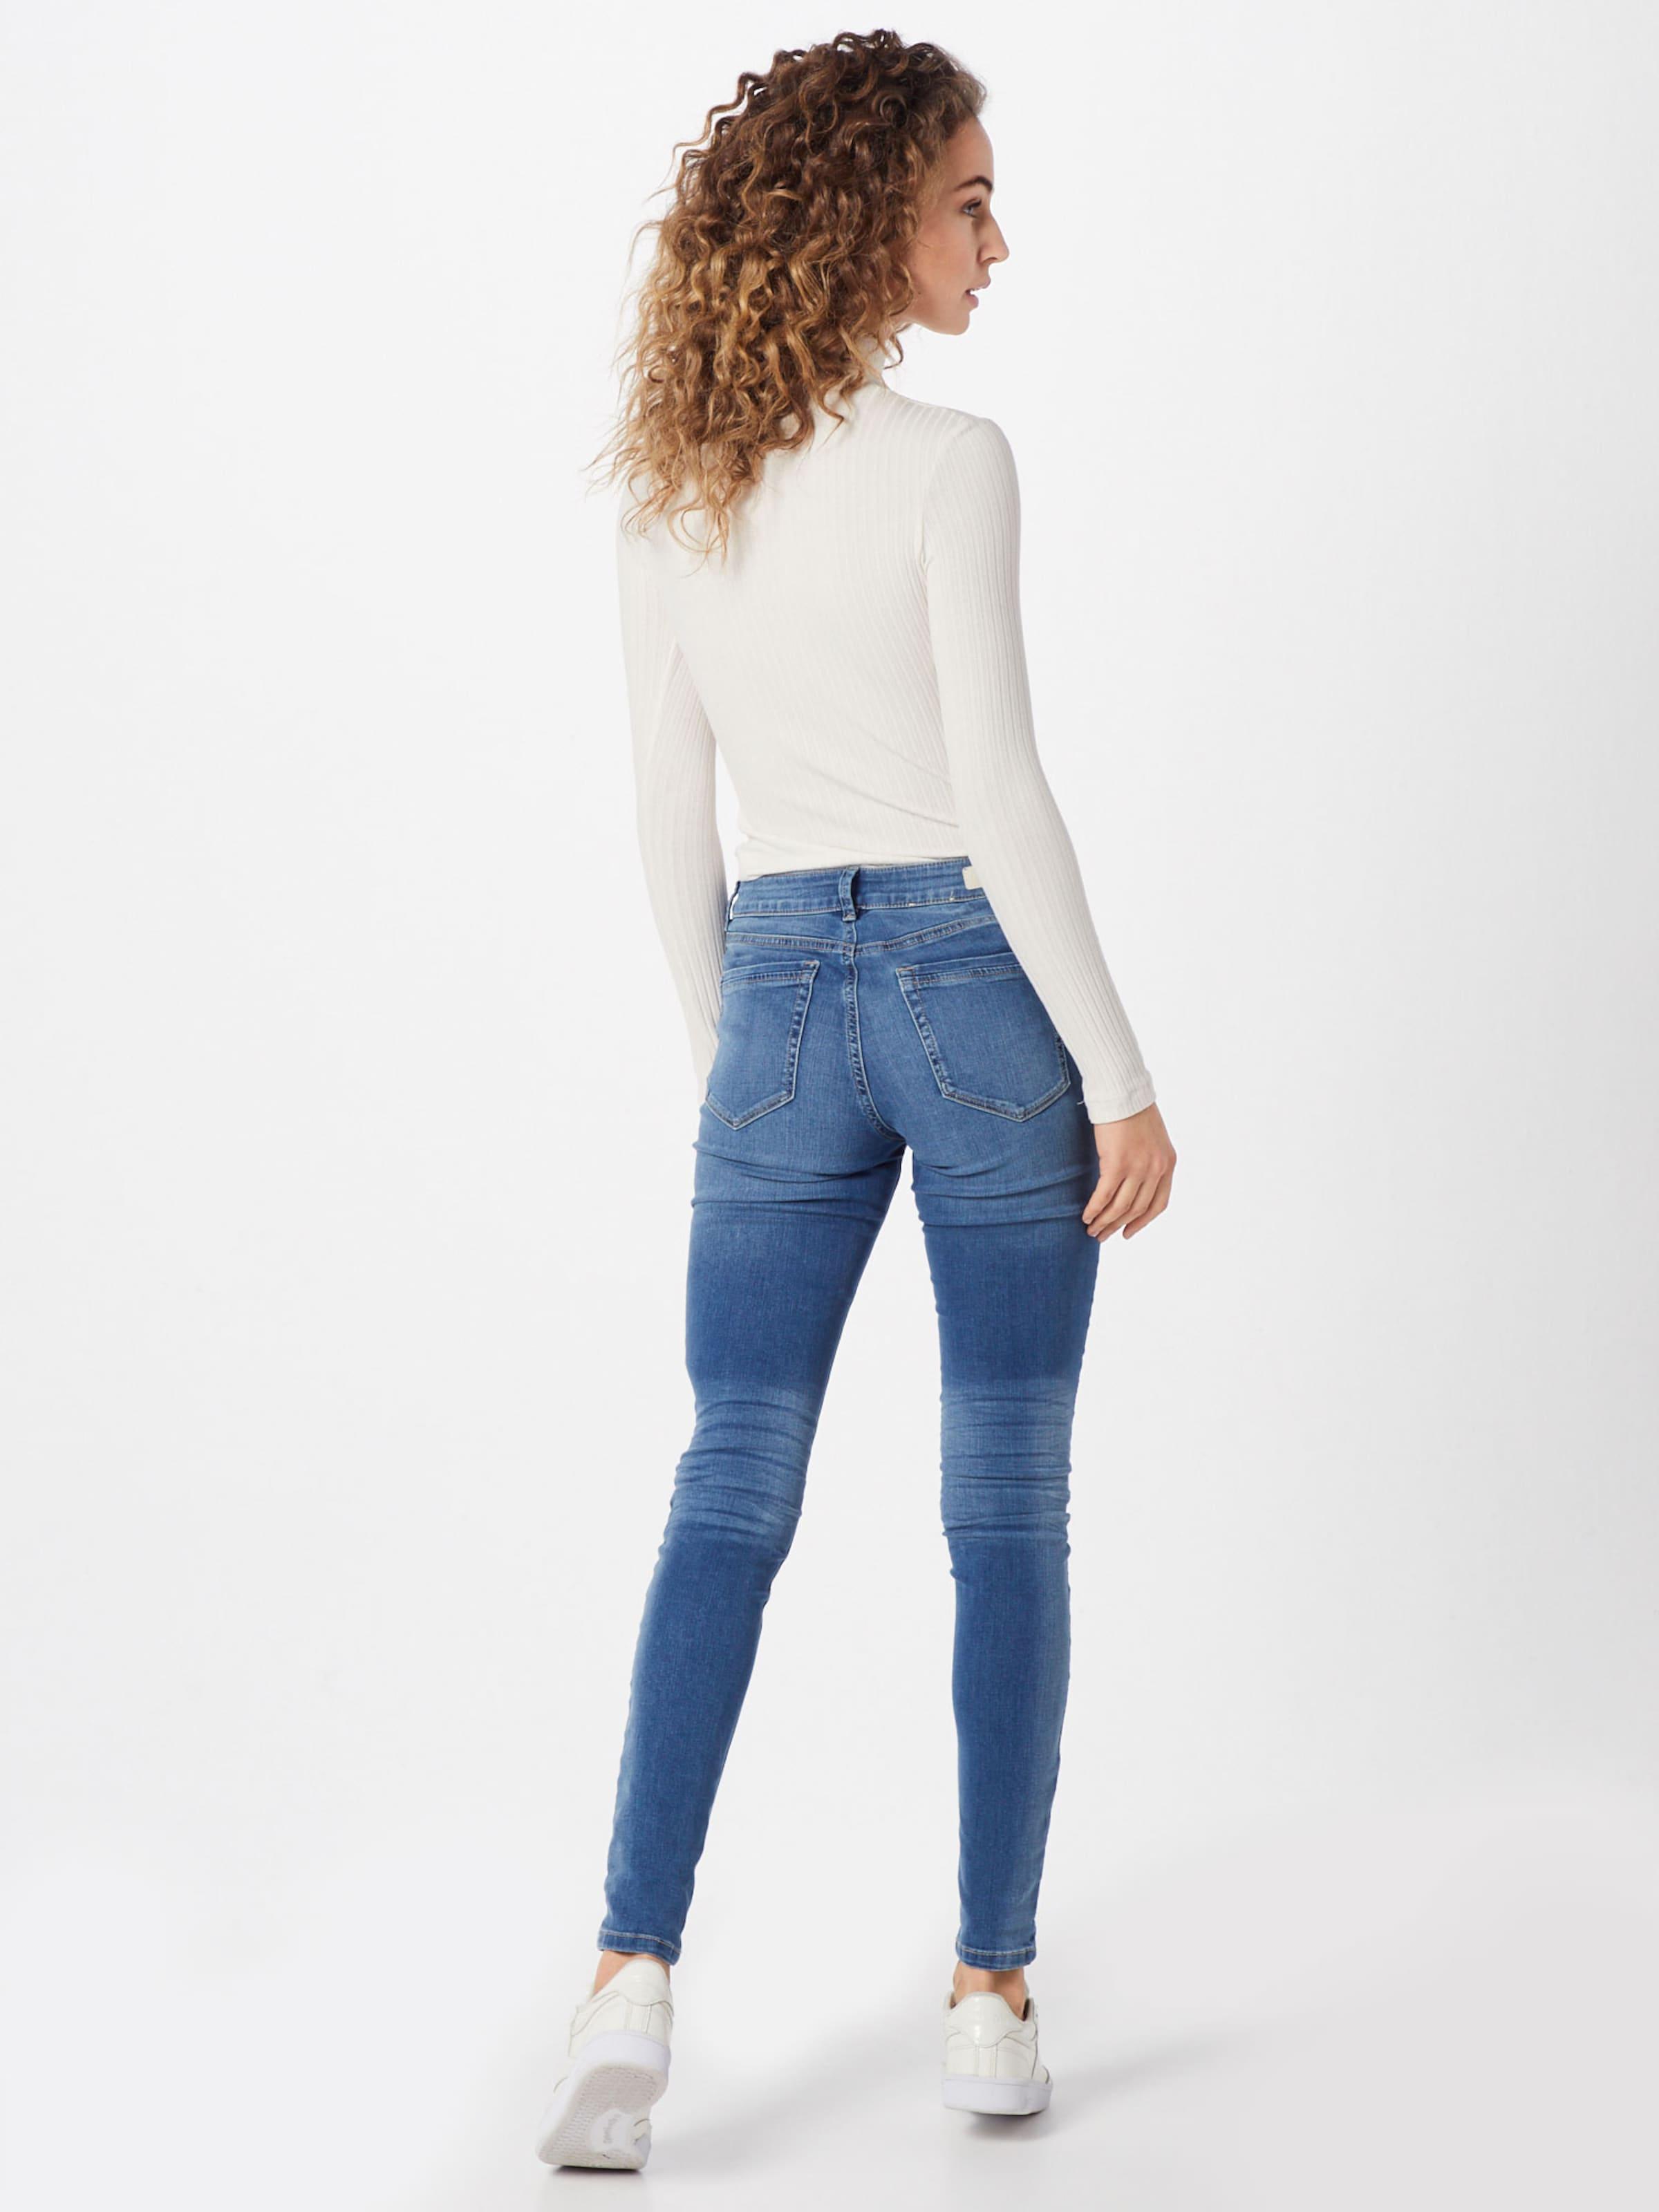 In Denim Blue Tailor Jeans Tom hdQrotxBsC